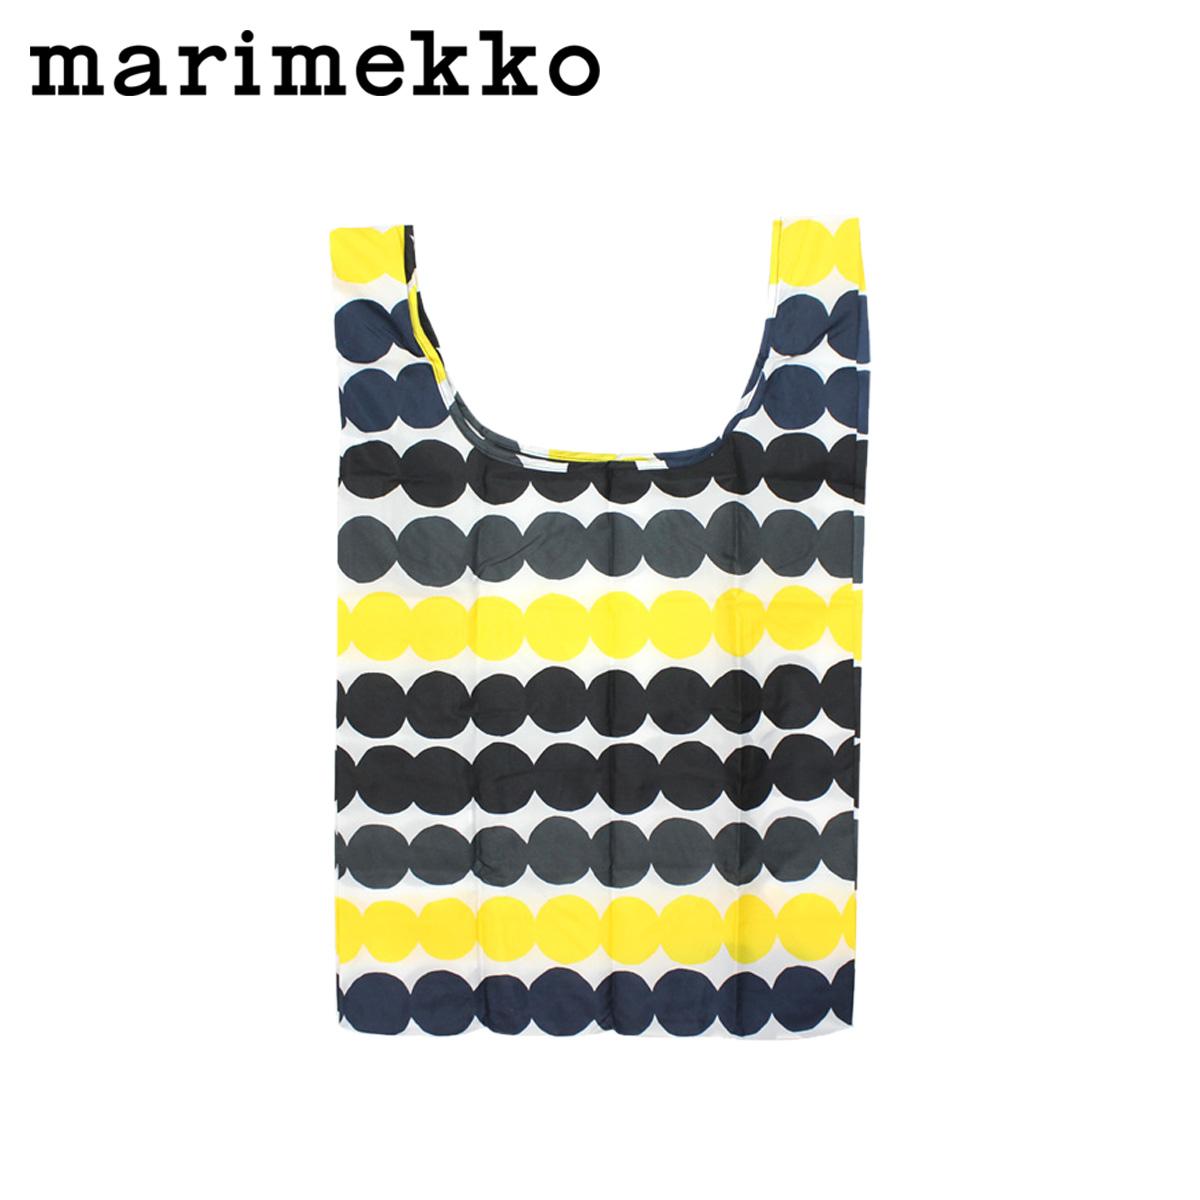 sugar online shop marimekko marimekko 041402 rasymatto. Black Bedroom Furniture Sets. Home Design Ideas